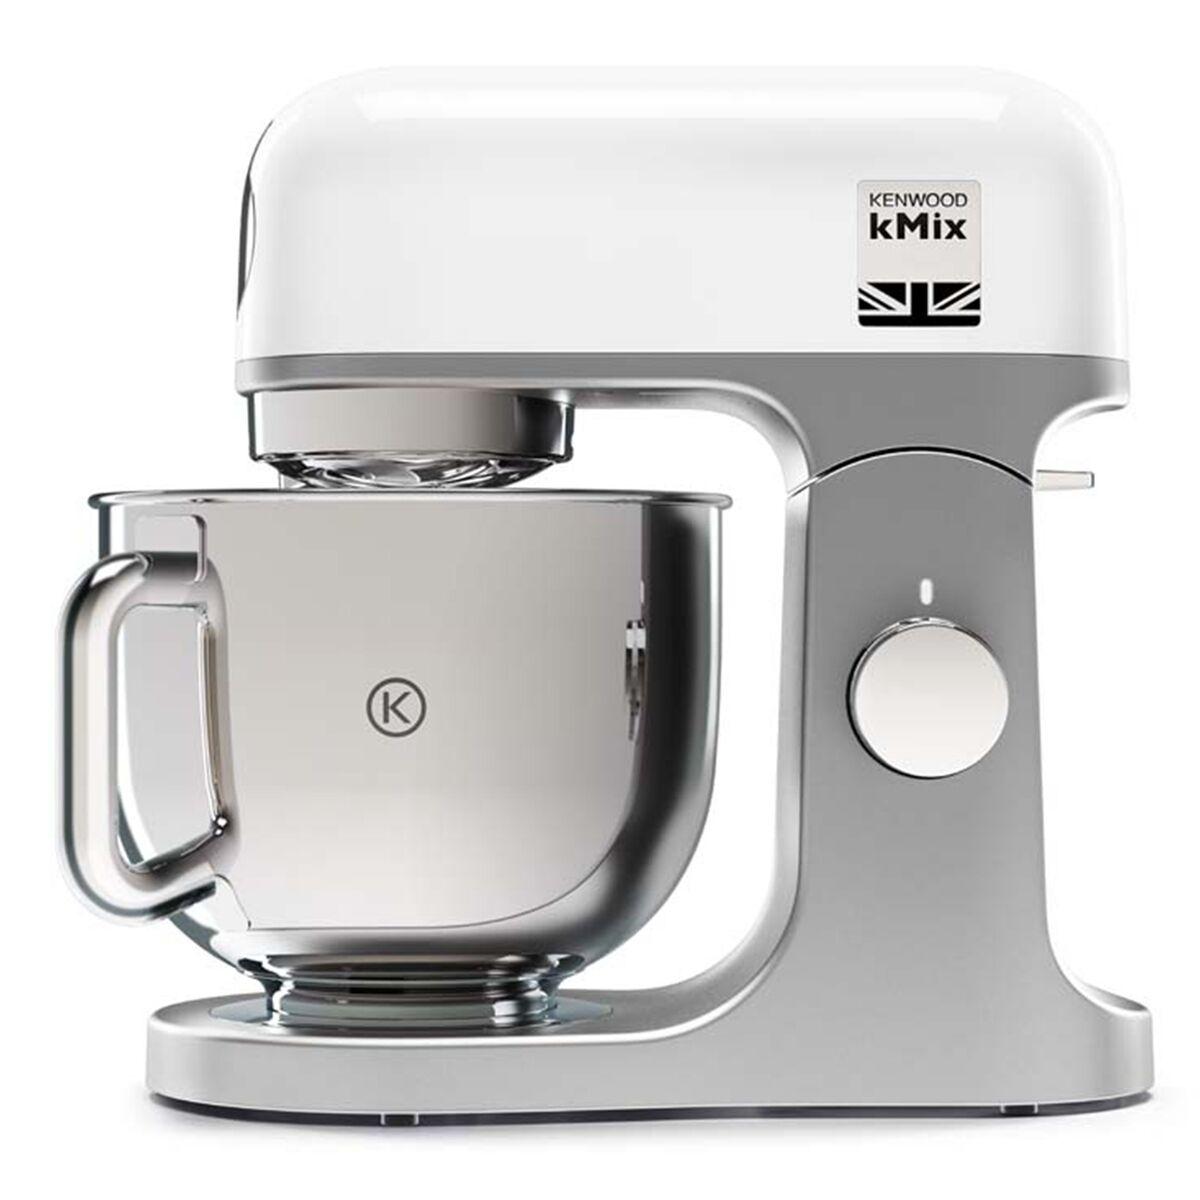 KENWOOD Robot pâtissier kMix KMX750WH